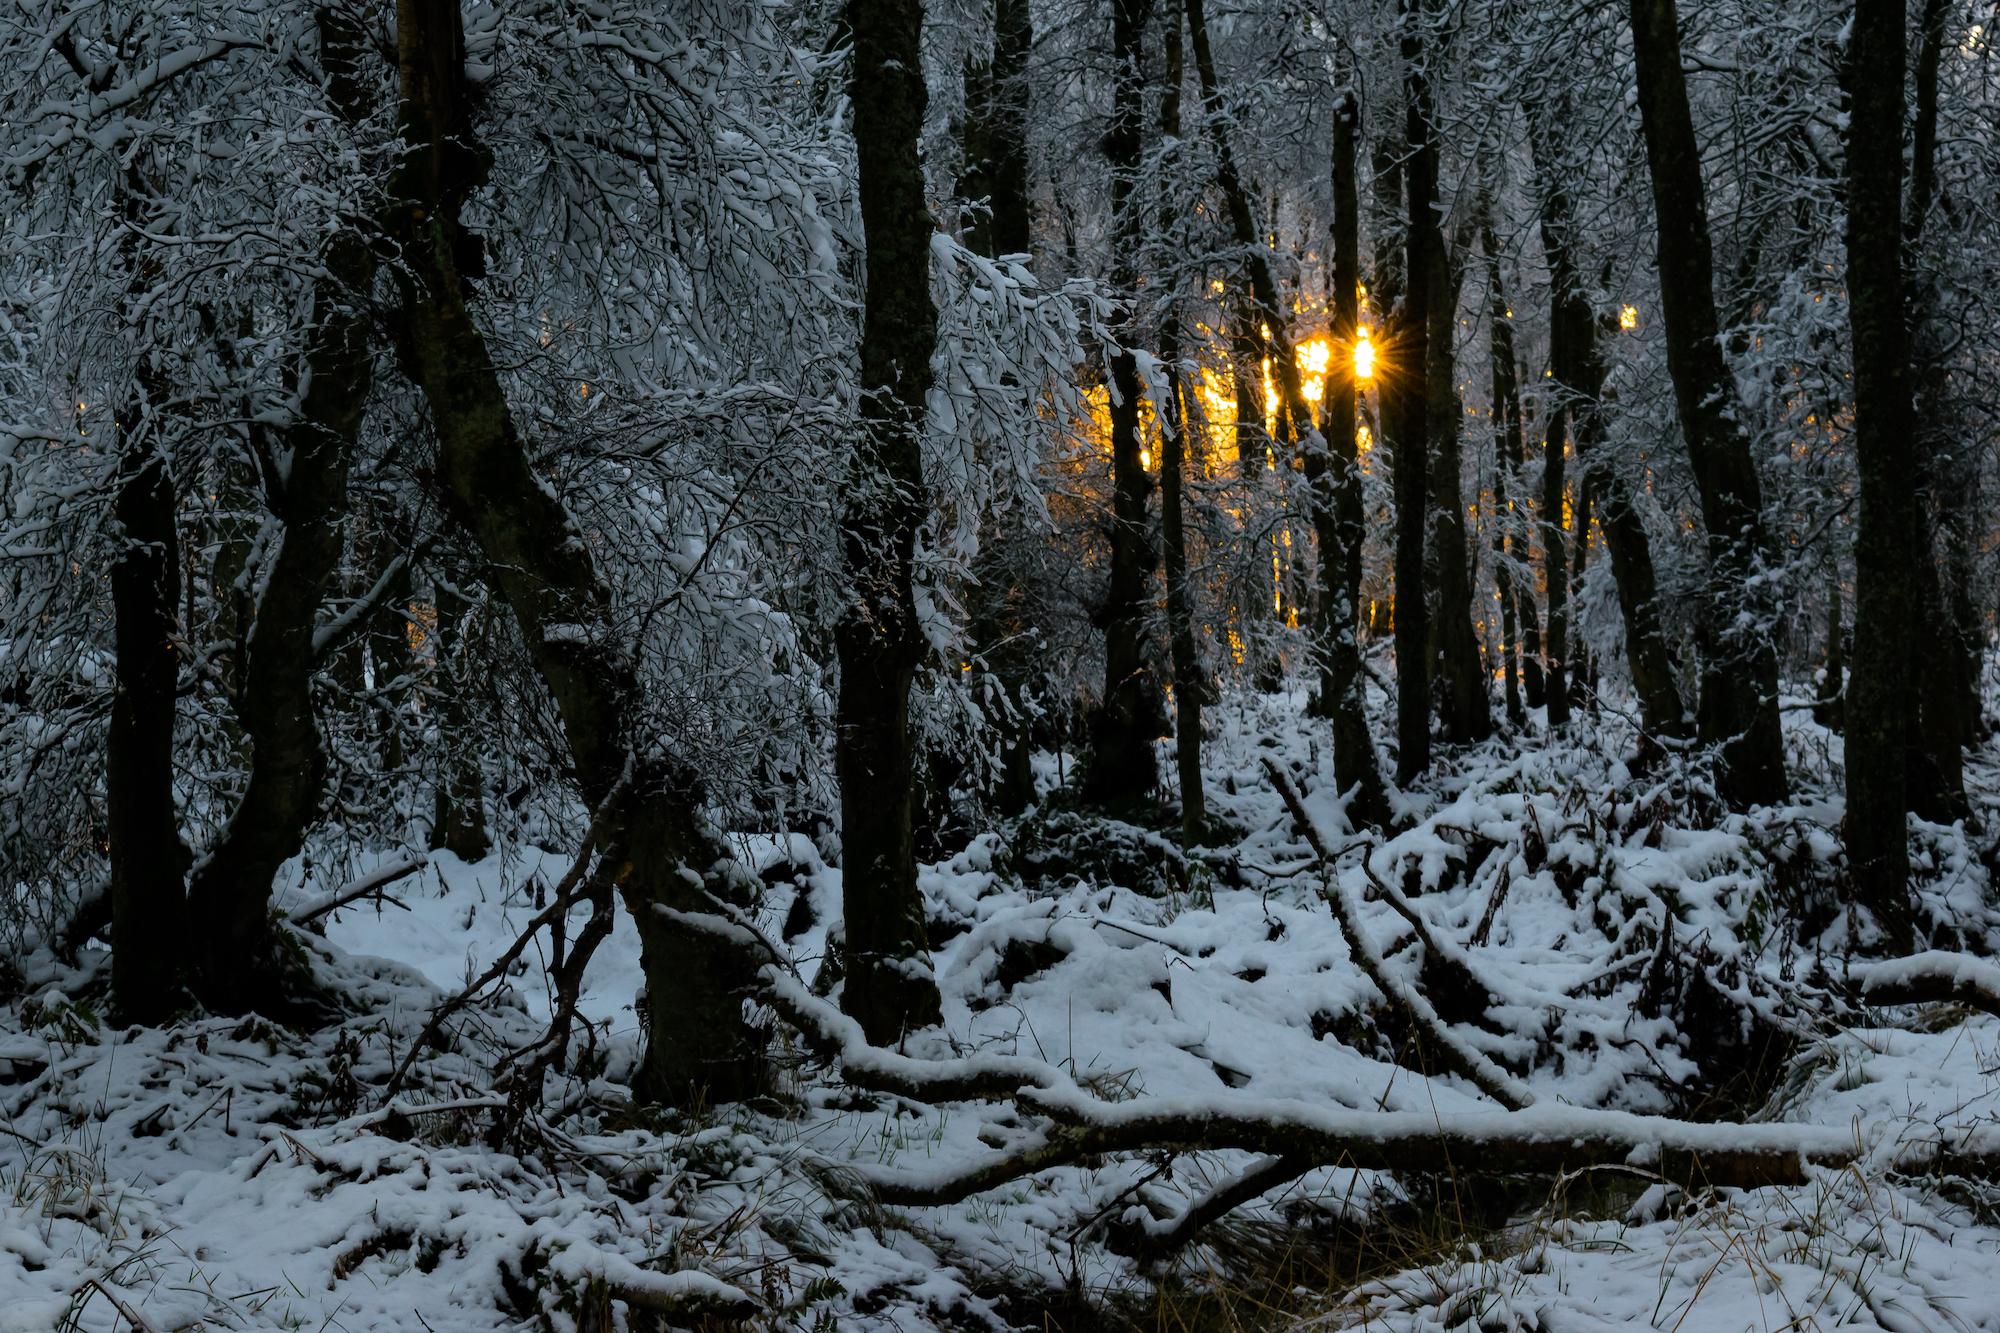 (941) Snow Sunset in Woodland, Harlaw, Pentland Hills, Edinburgh, Scotland.jpg